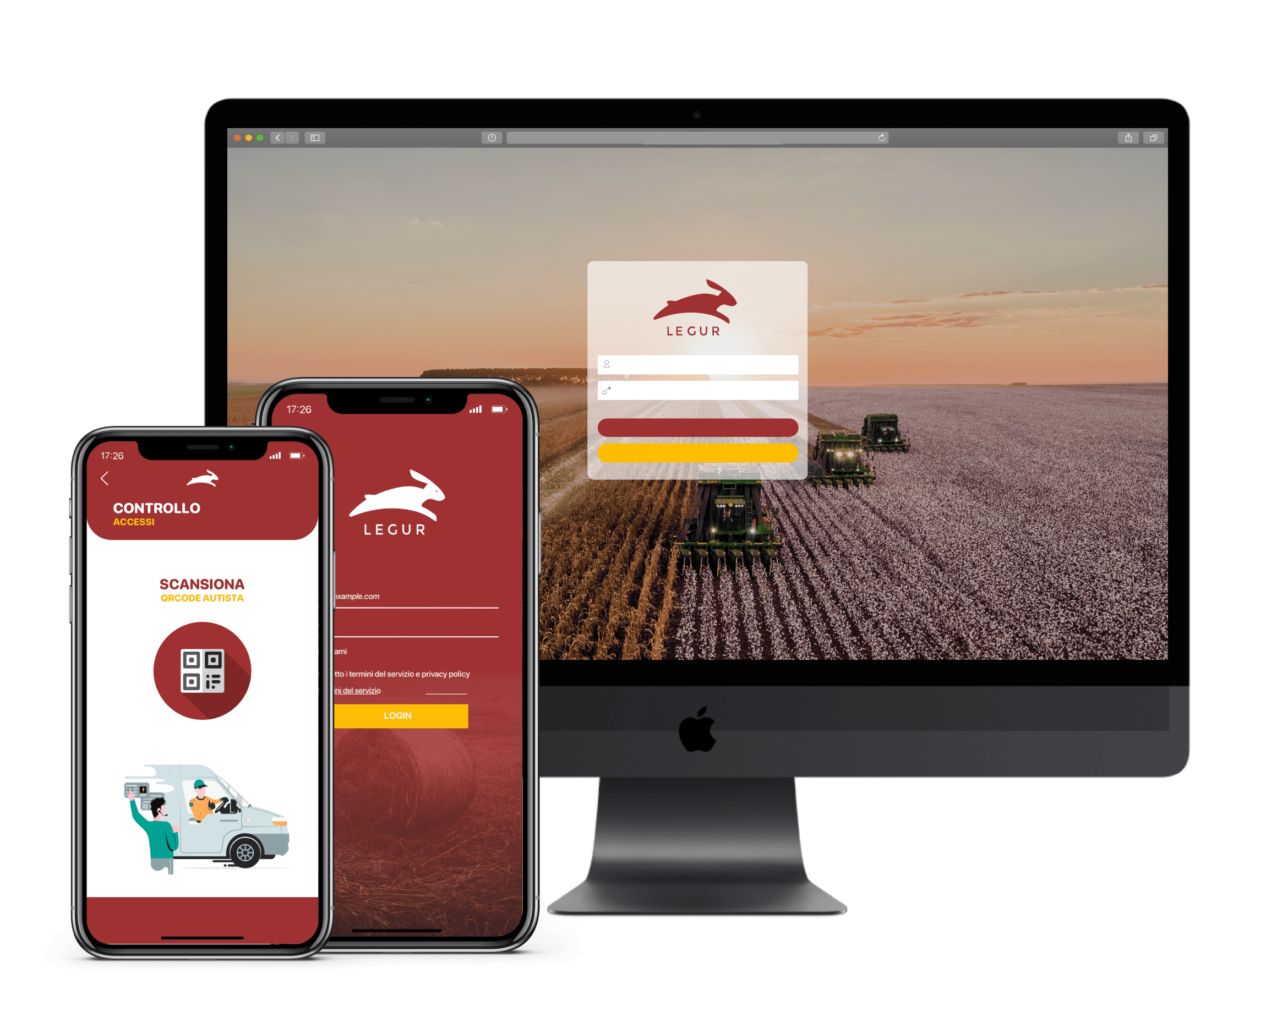 Startup_logistica_settore_agroalimentare